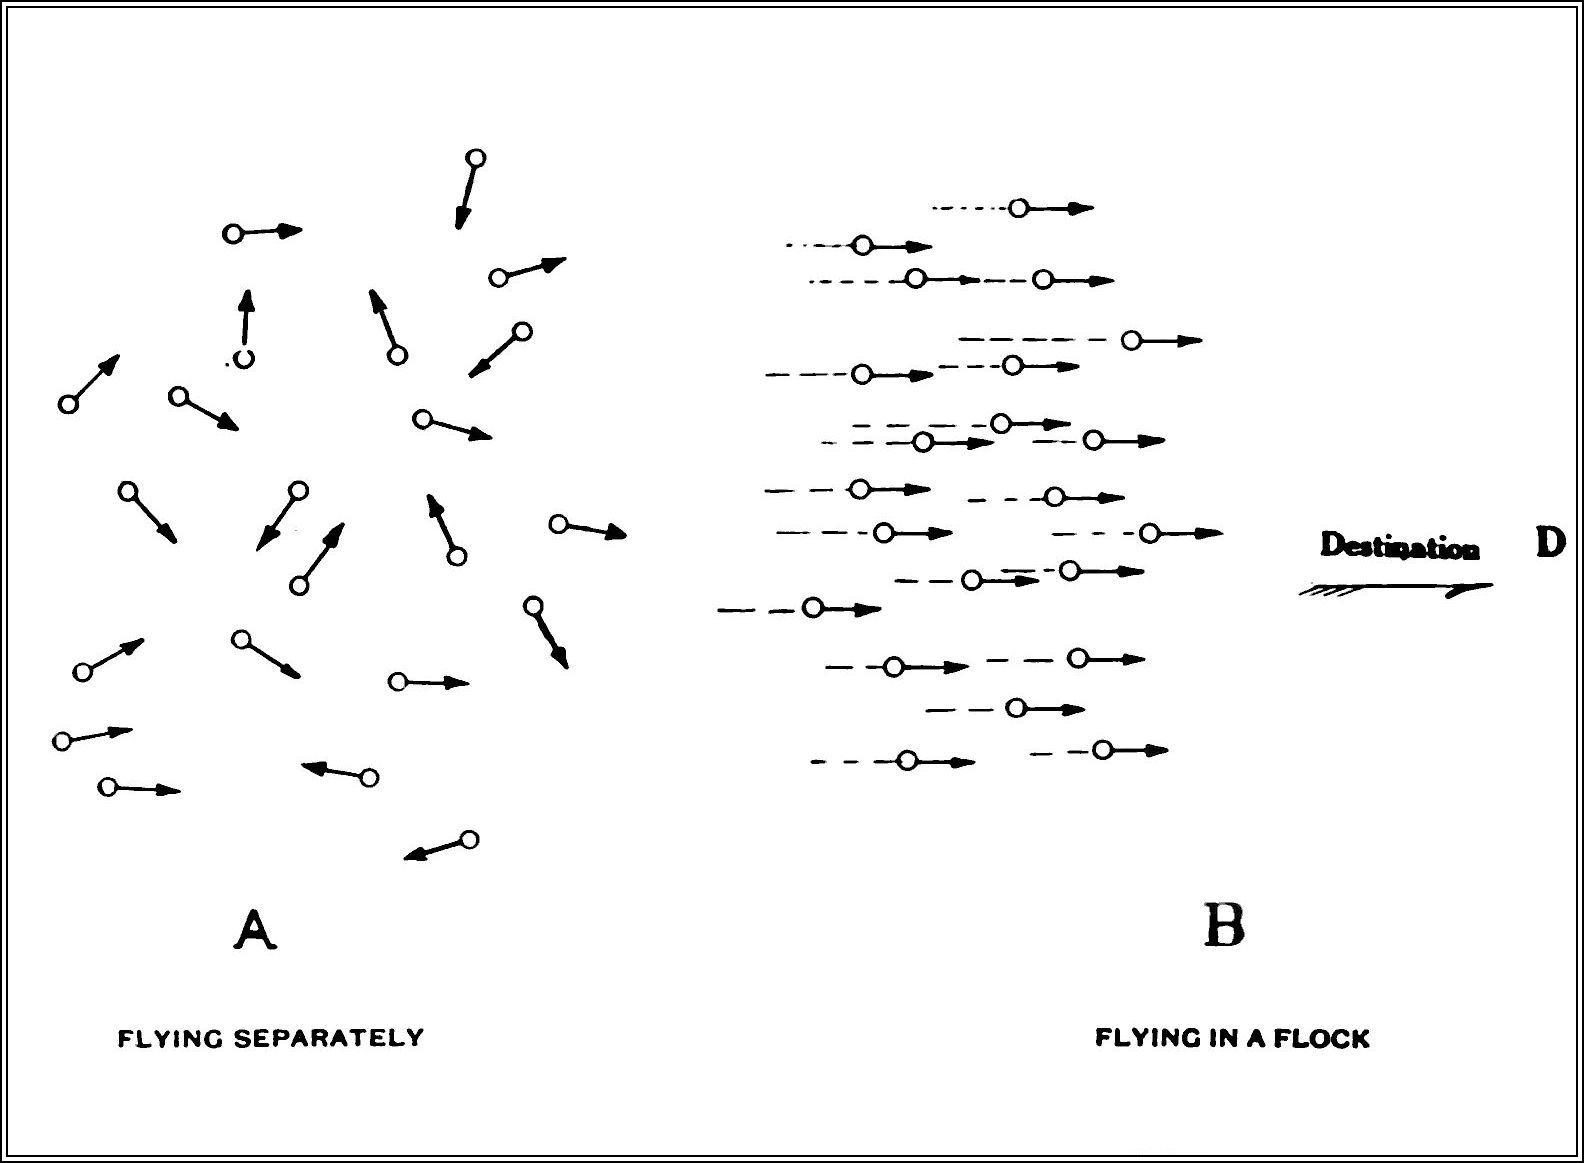 http://upload.wikimedia.org/wikipedia/commons/e/e6/PSM_V84_D214_Flocking_habit_of_migratory_birds_fig1.jpg